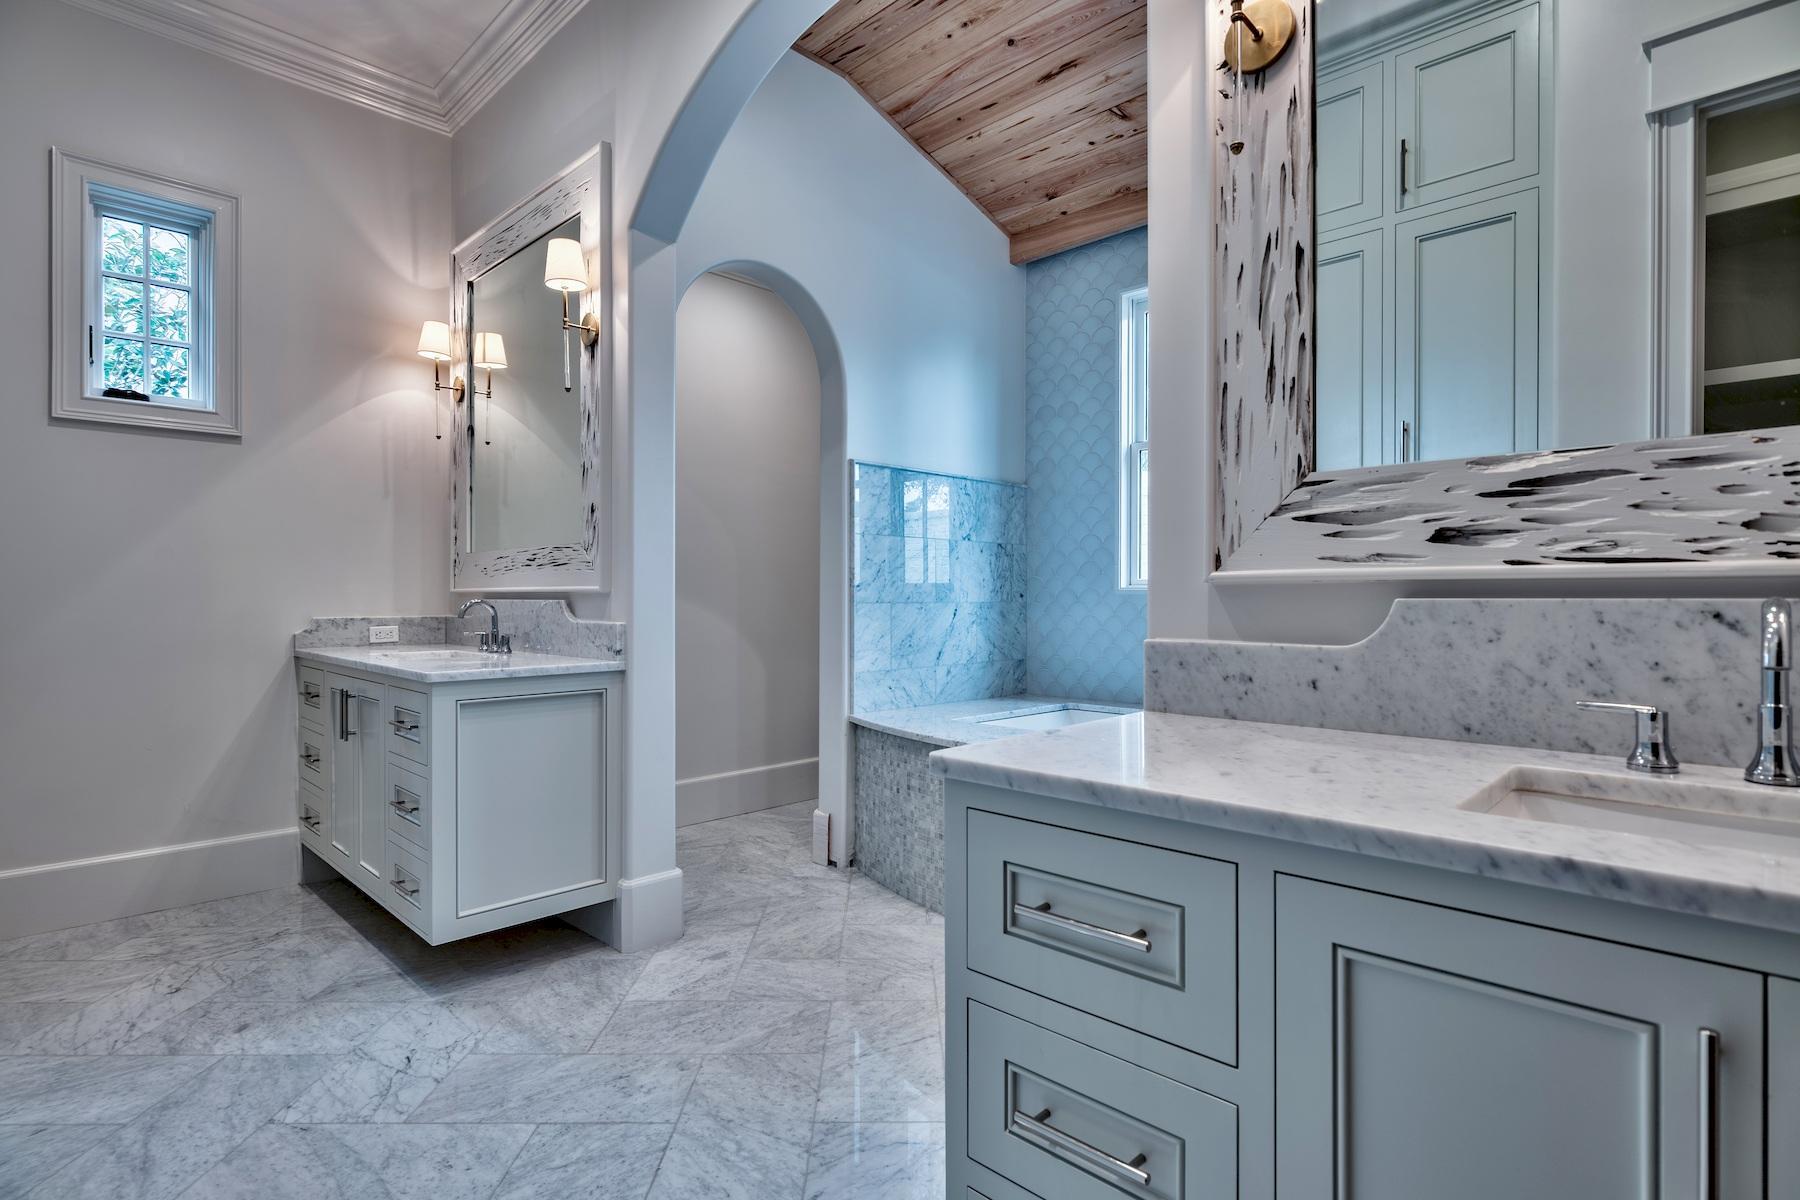 107 Grove,Santa Rosa Beach,Florida 32459,5 Bedrooms Bedrooms,5 BathroomsBathrooms,Detached single family,Grove,20131126143817002353000000